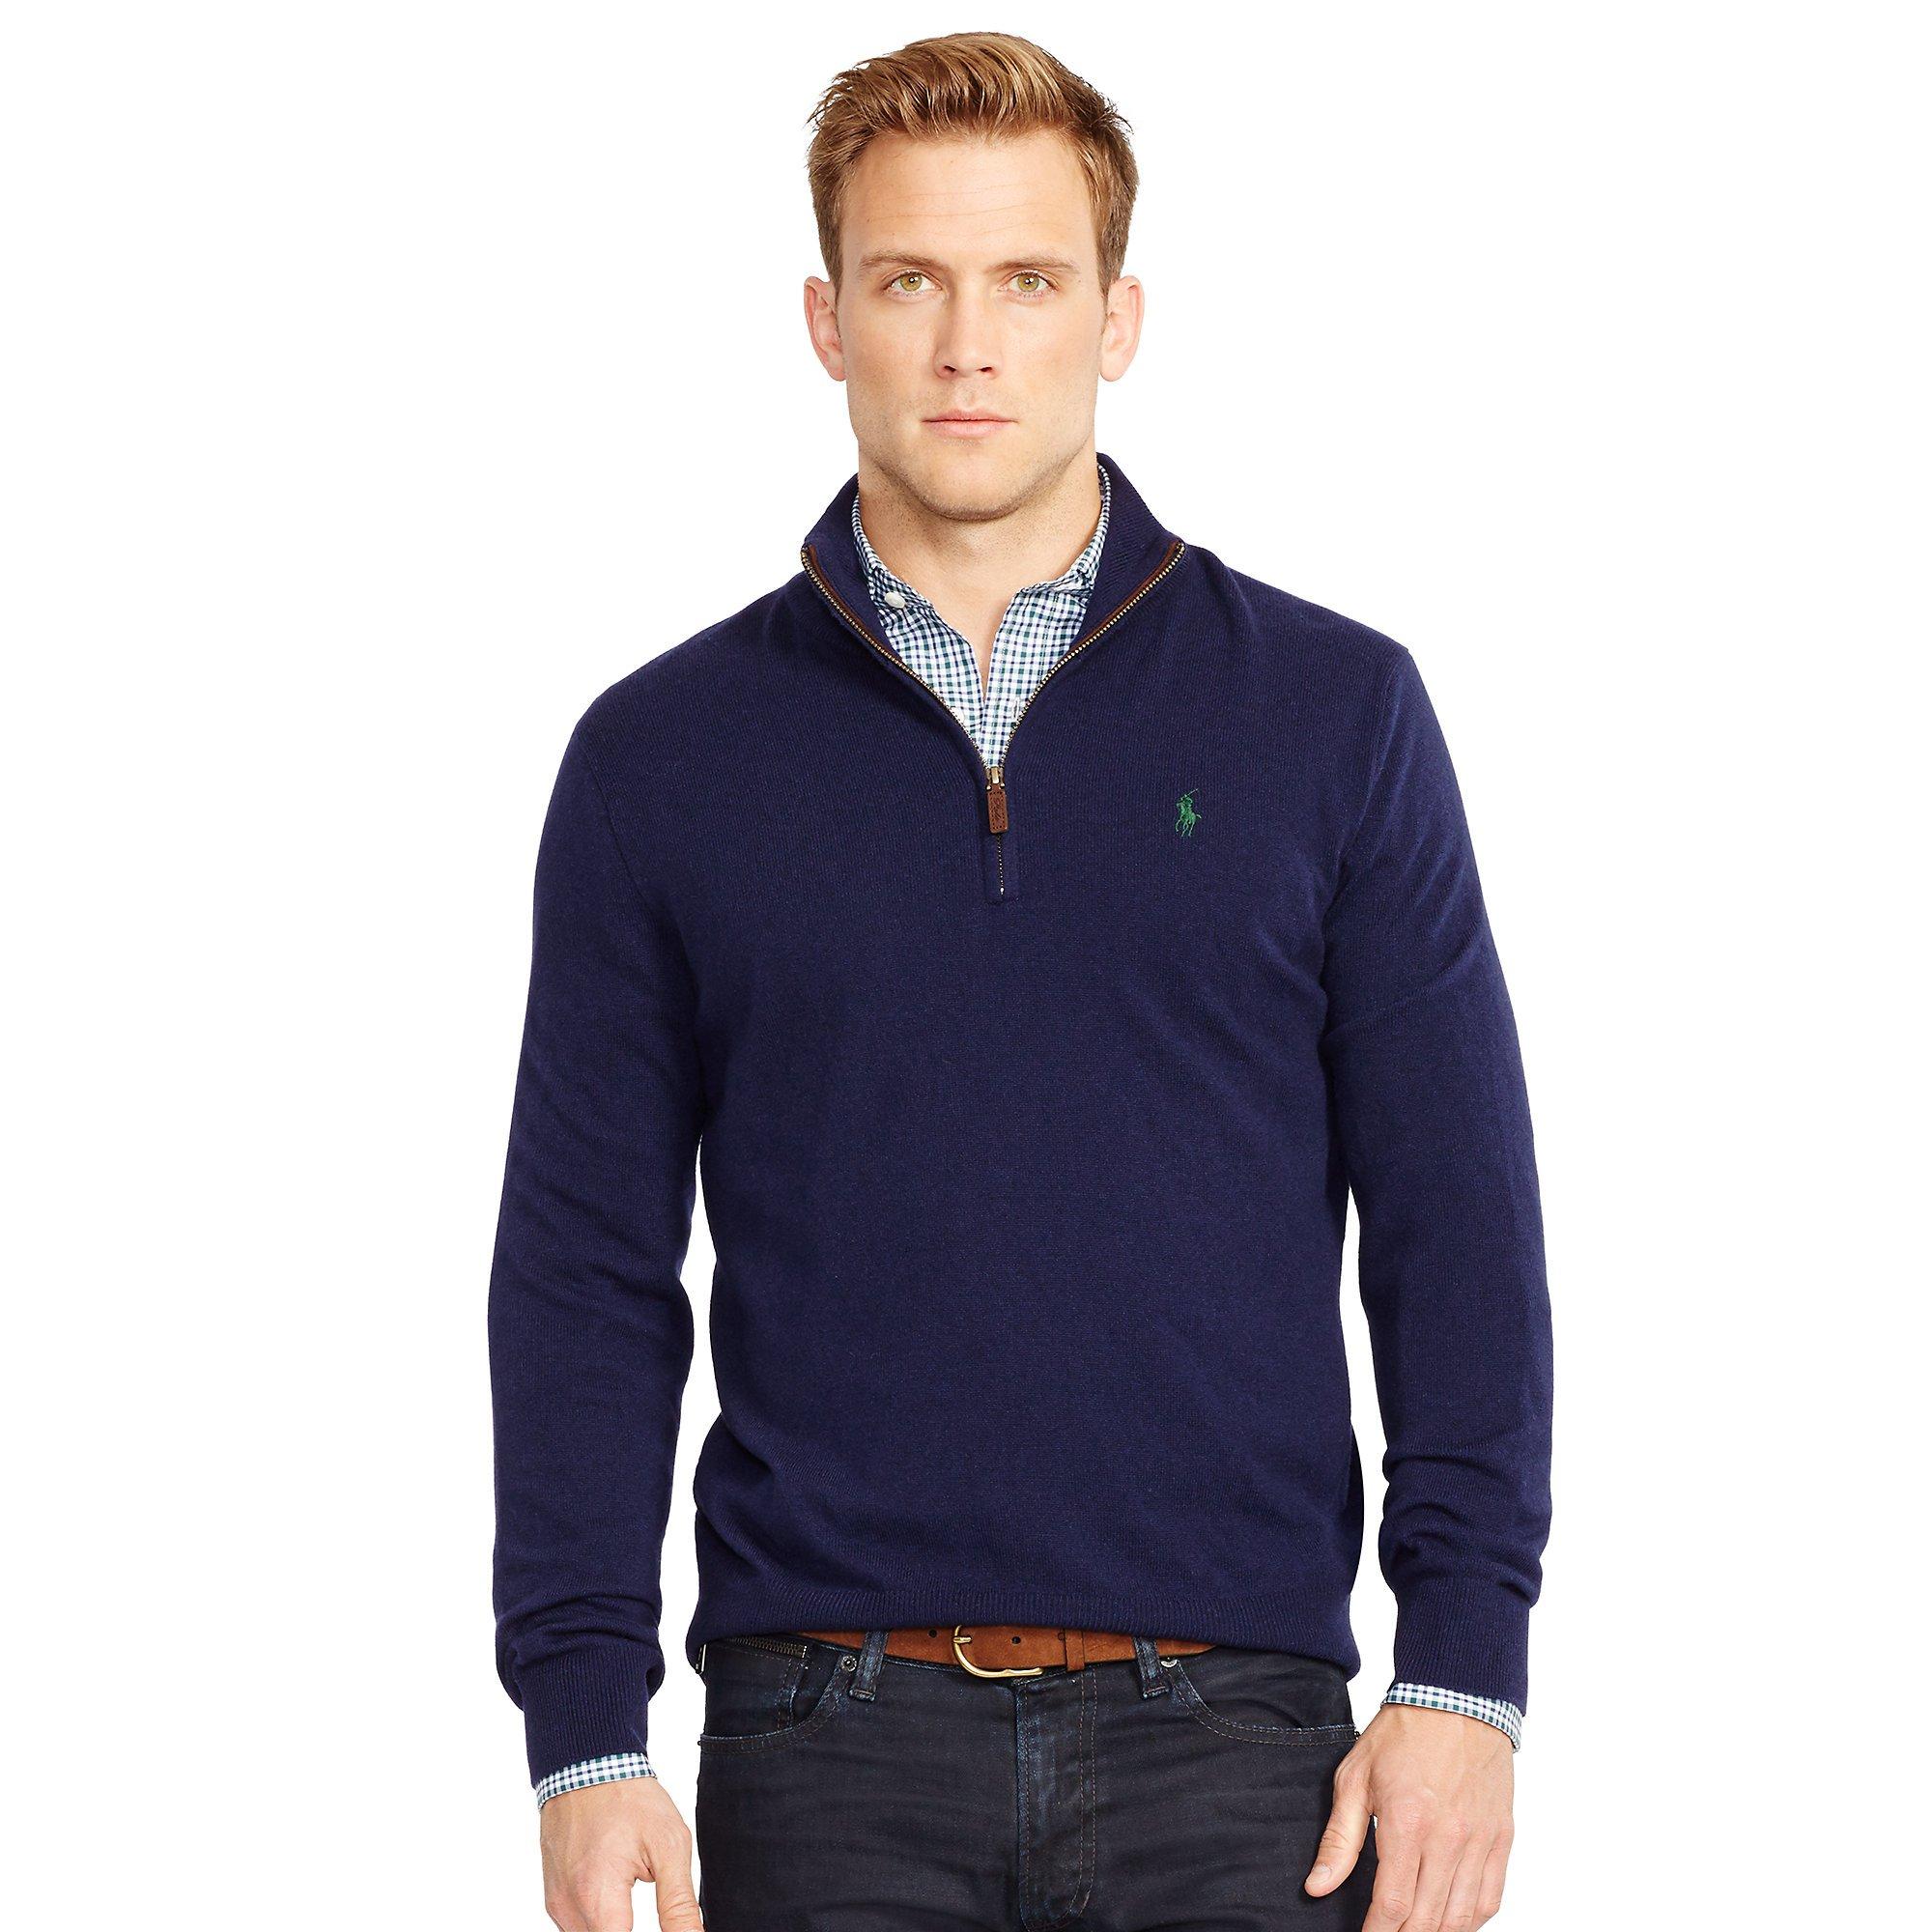 polo ralph lauren wool half zip sweater in blue for men lyst. Black Bedroom Furniture Sets. Home Design Ideas